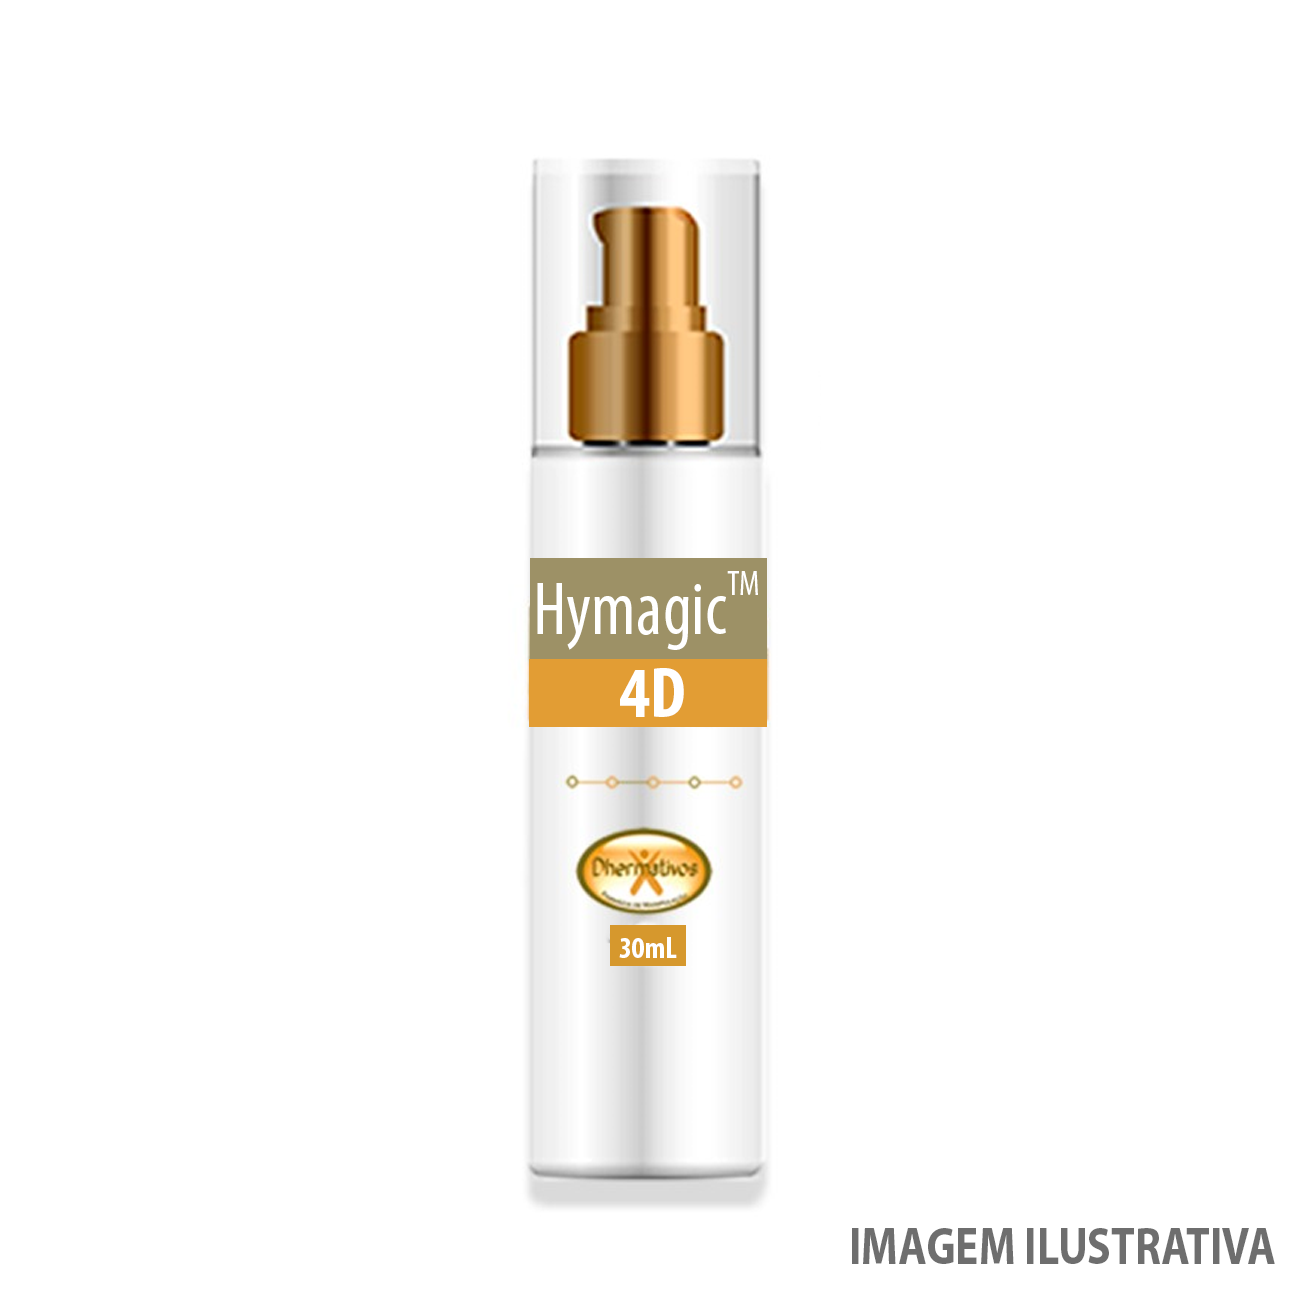 Booster Hidratante com Hymagic 4D